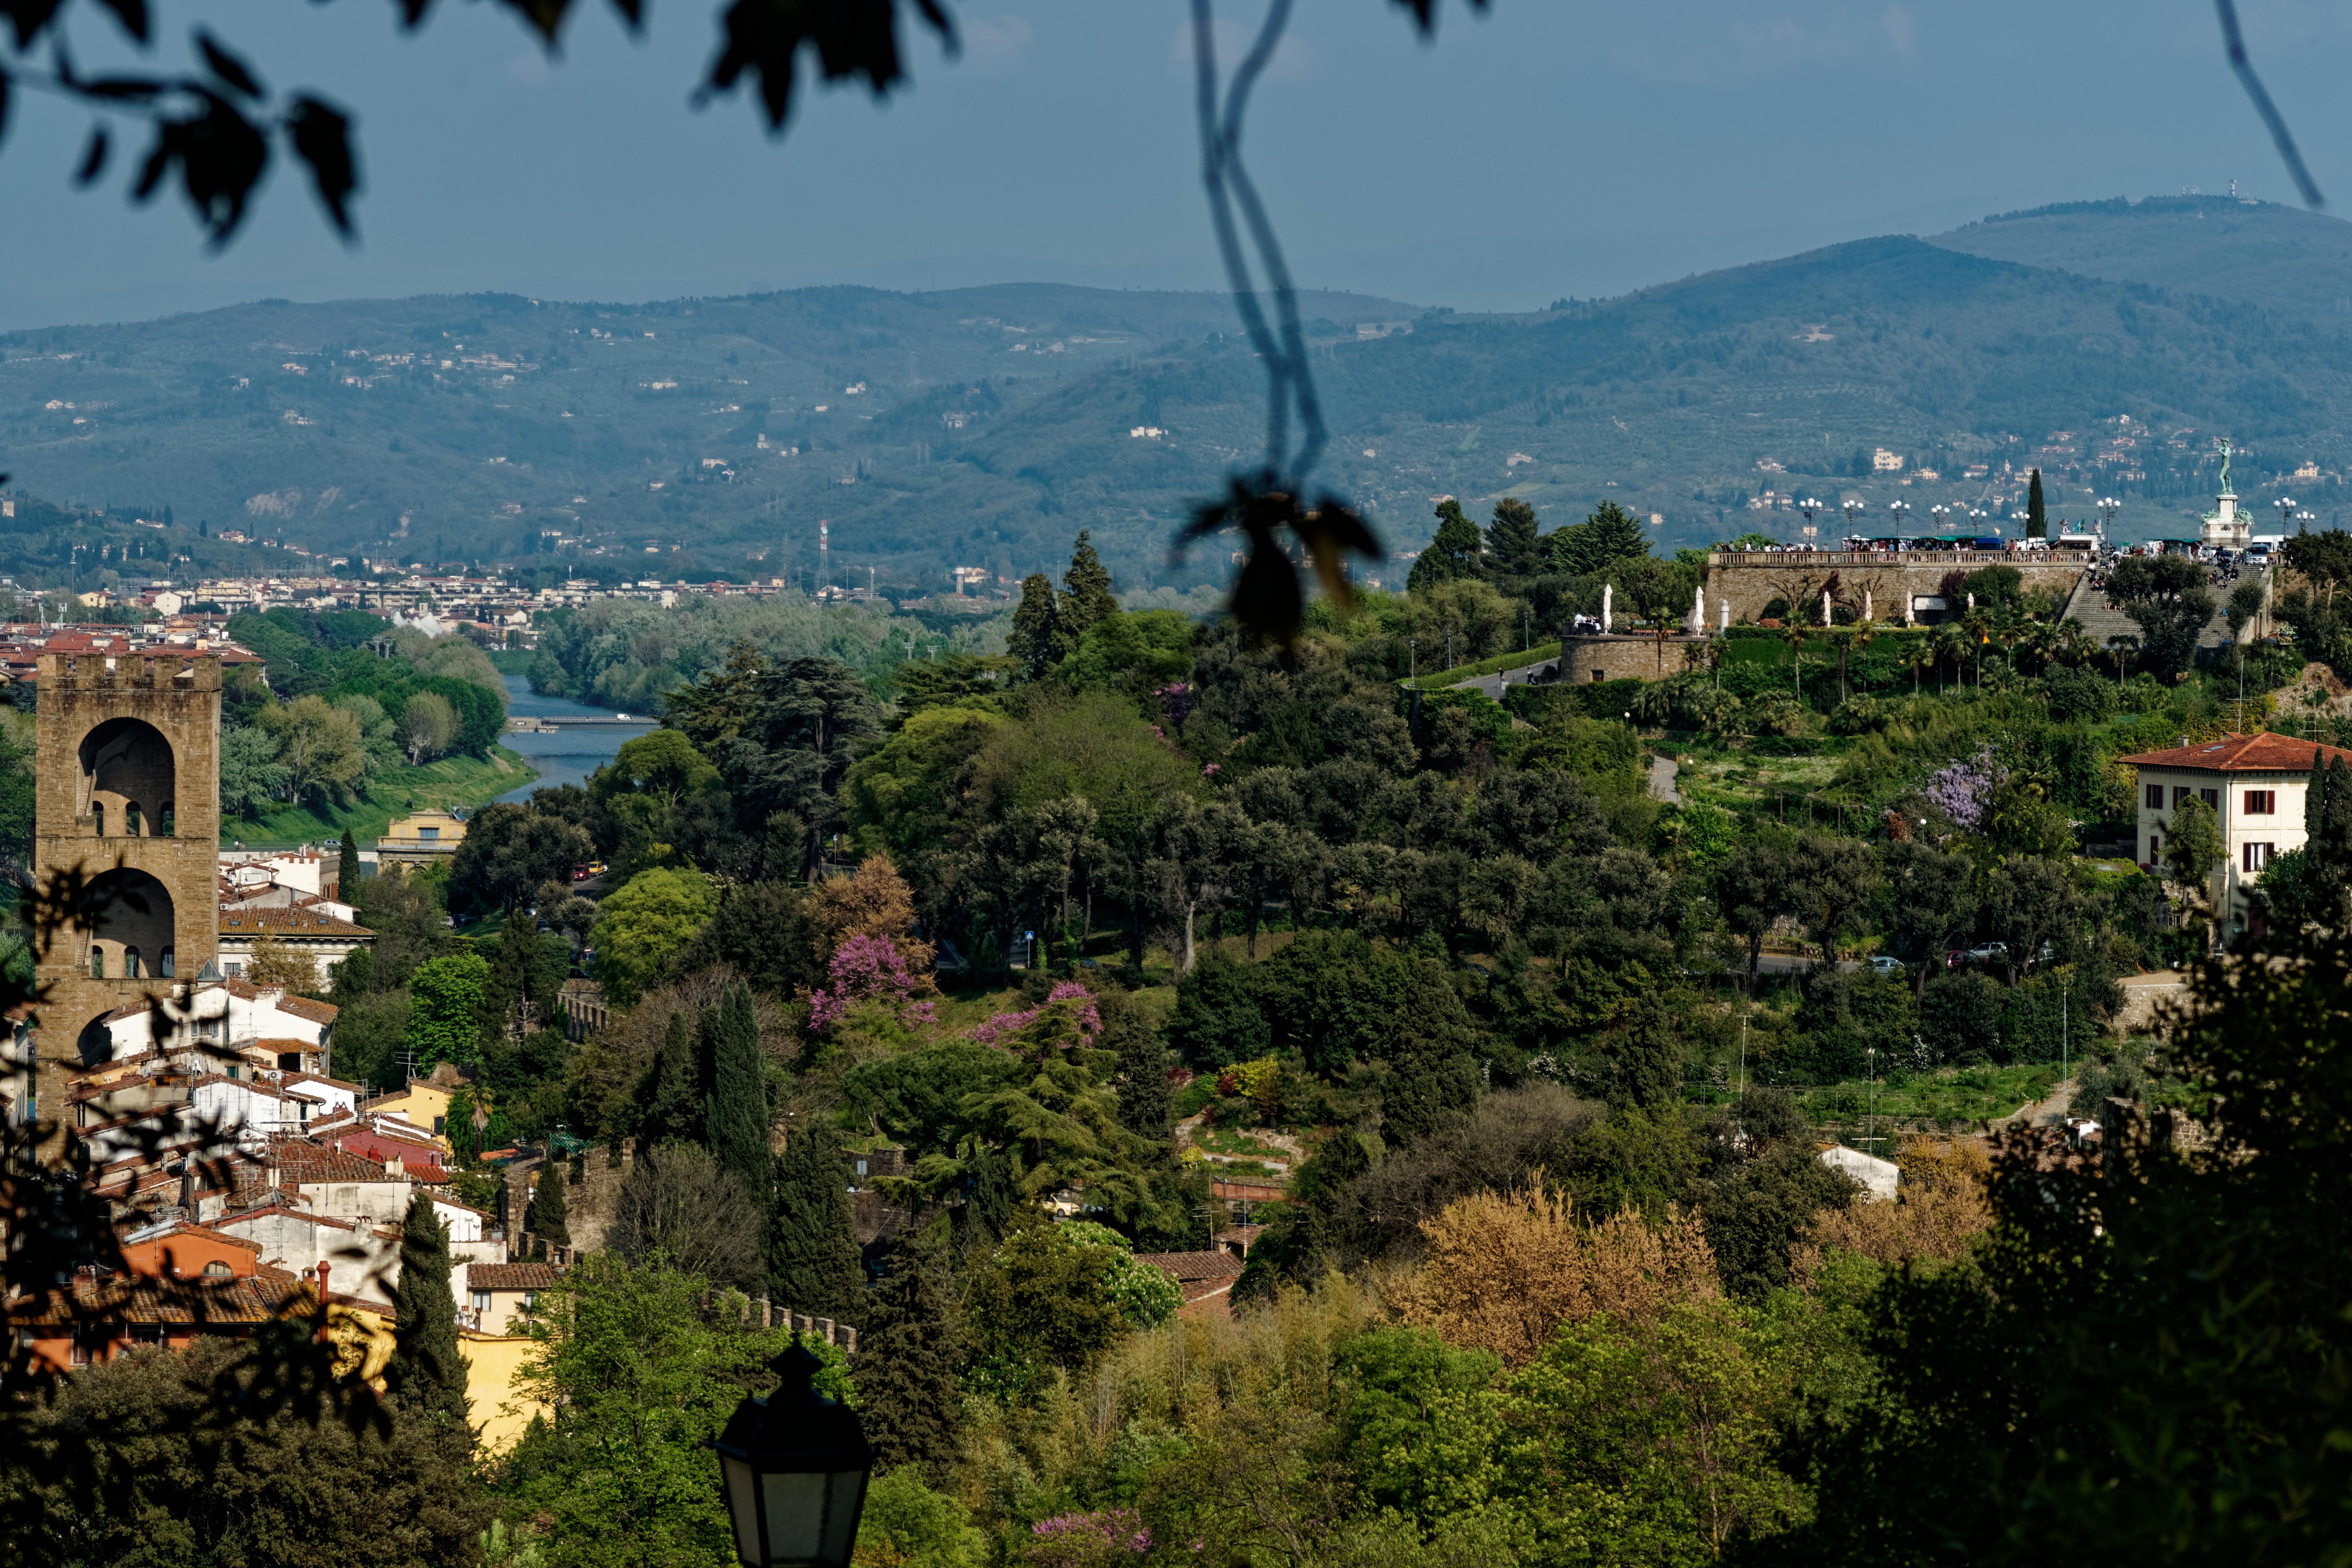 Firenze - Florence - Giardino Bardini, View east inbetween Porta San Niccolo and Piazzale Michelangelo